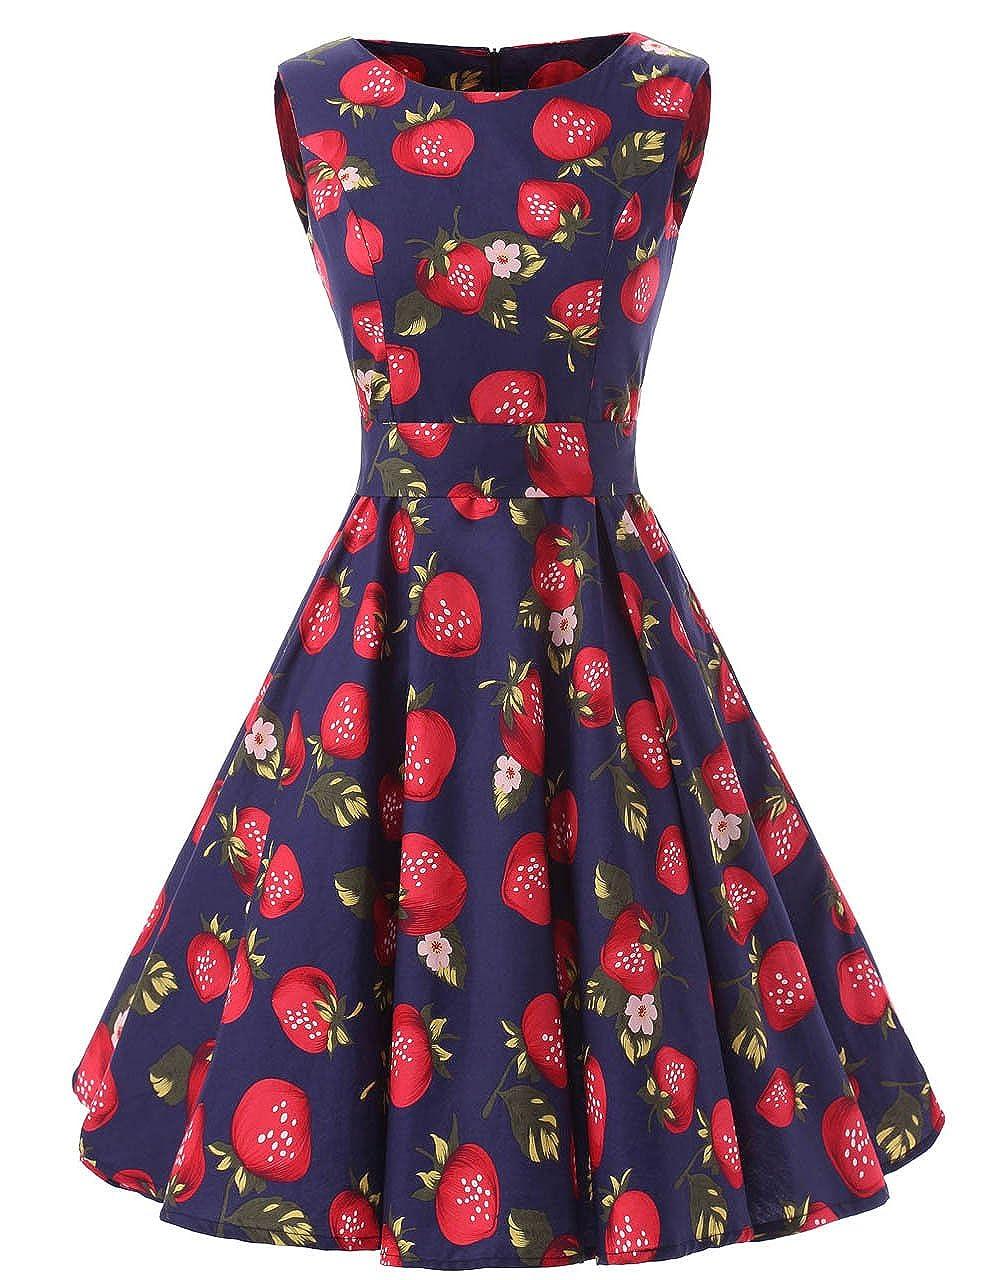 Strawberry Ensnovo Womens Vintage 1950s Sleeveless Retro Floral Print Rockabilly Swing Dress